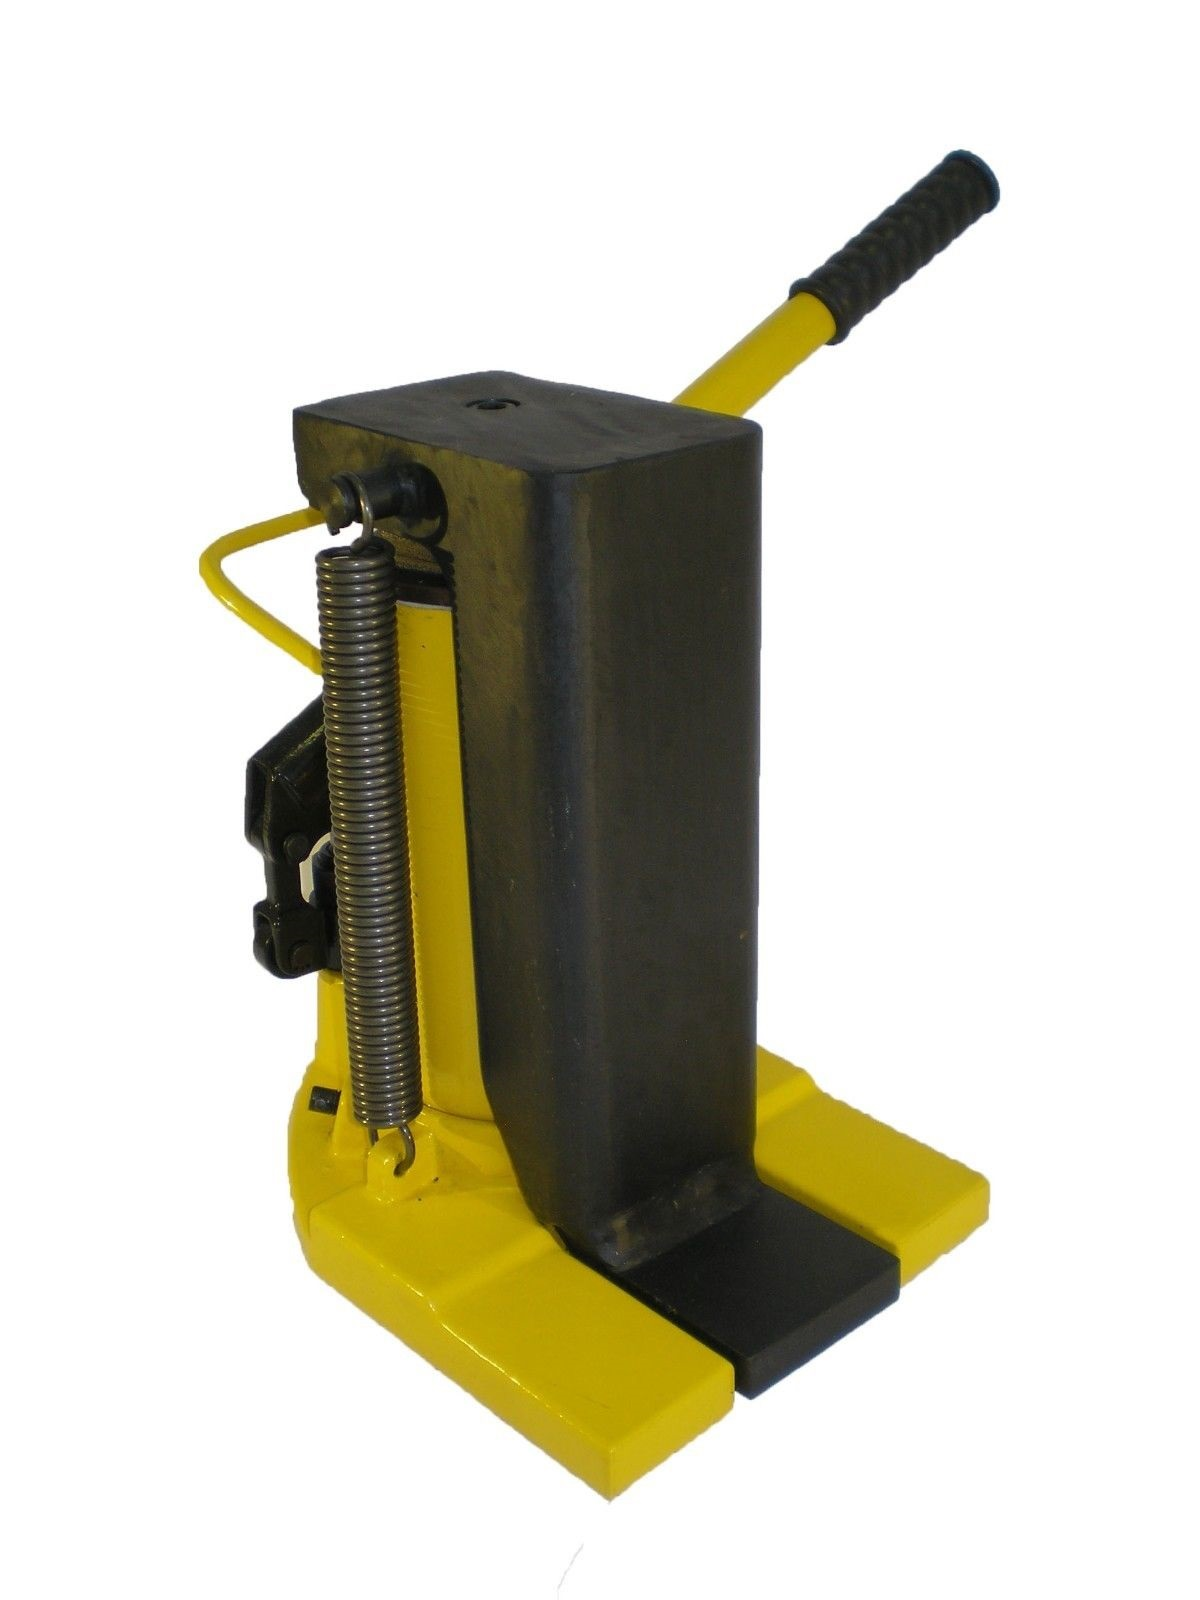 New 10 Ton Hydraulic Tow Ram Jack Qd10 Uncle Wiener S